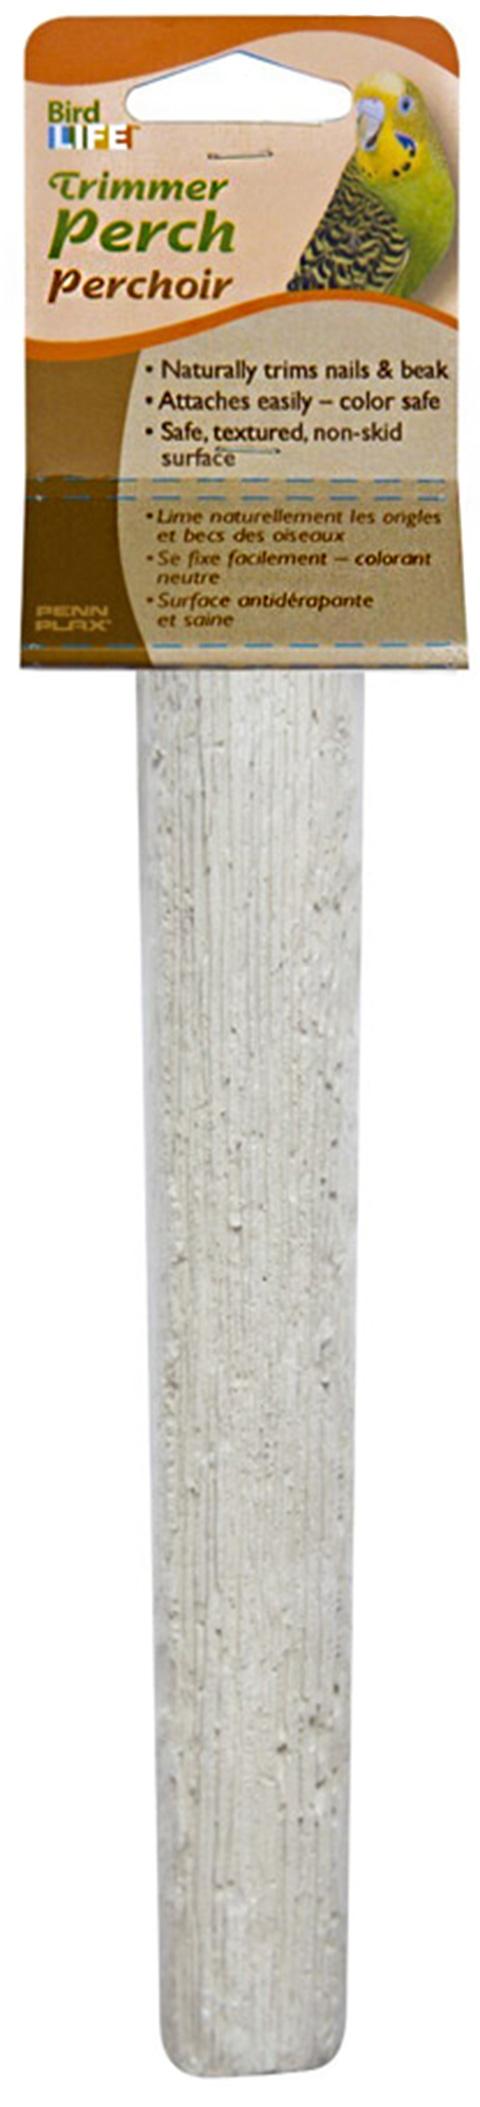 Жердочка для птиц Penn-Plax минеральная 20 х 4 см (1 шт) penn plax переноска клетка penn plax для грызунов и птиц большая